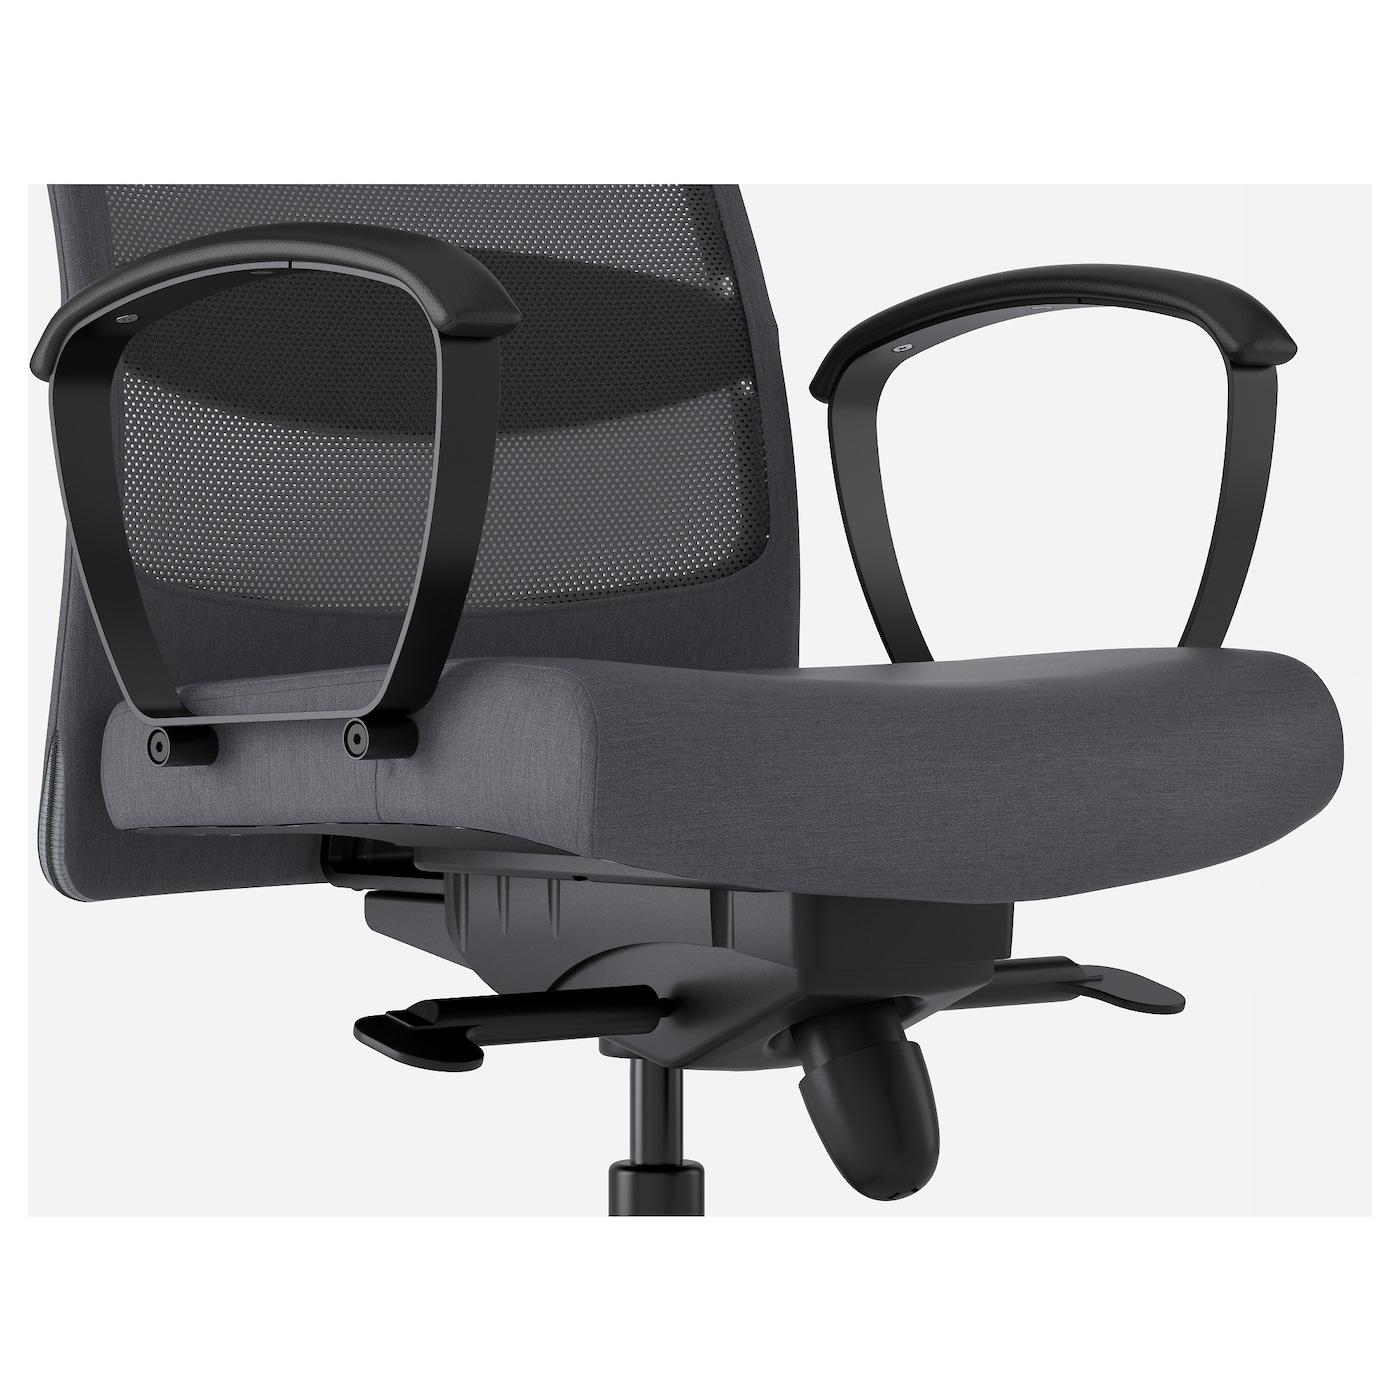 rsp lewis antonio storm buyjohn com swivel at johnlewis john online pdp chair riley main chairs